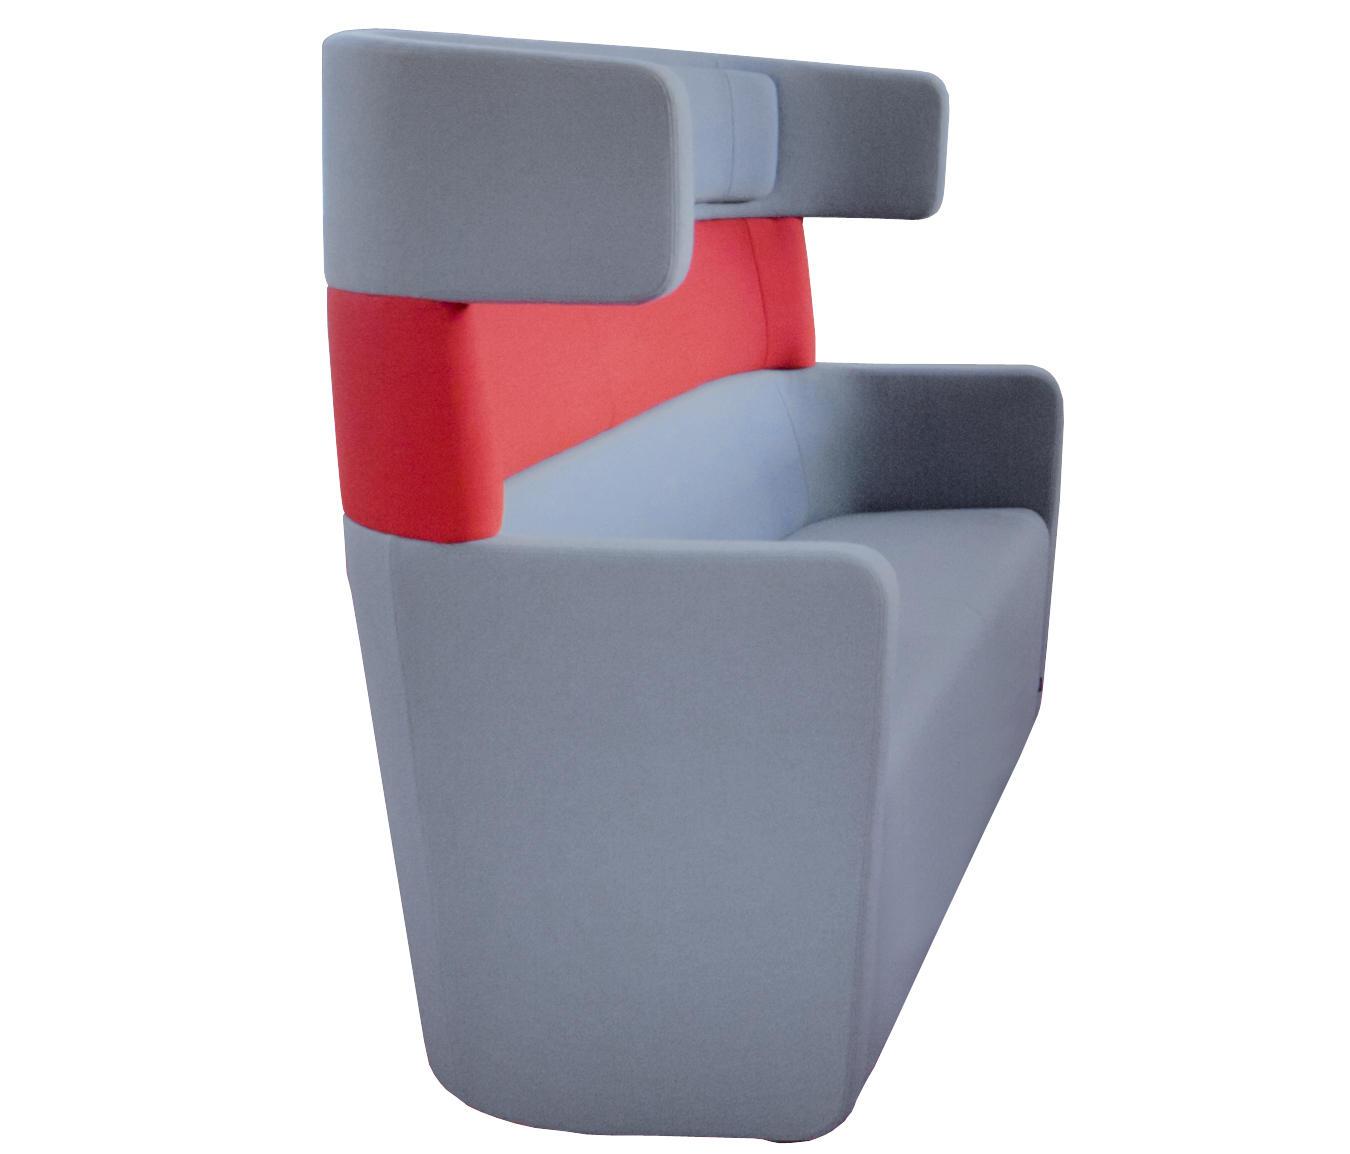 Leather Sofas Preston Lancashire: Wing Sofa Innovation Wing Sofa Sleeper Modern Sofas Eurway